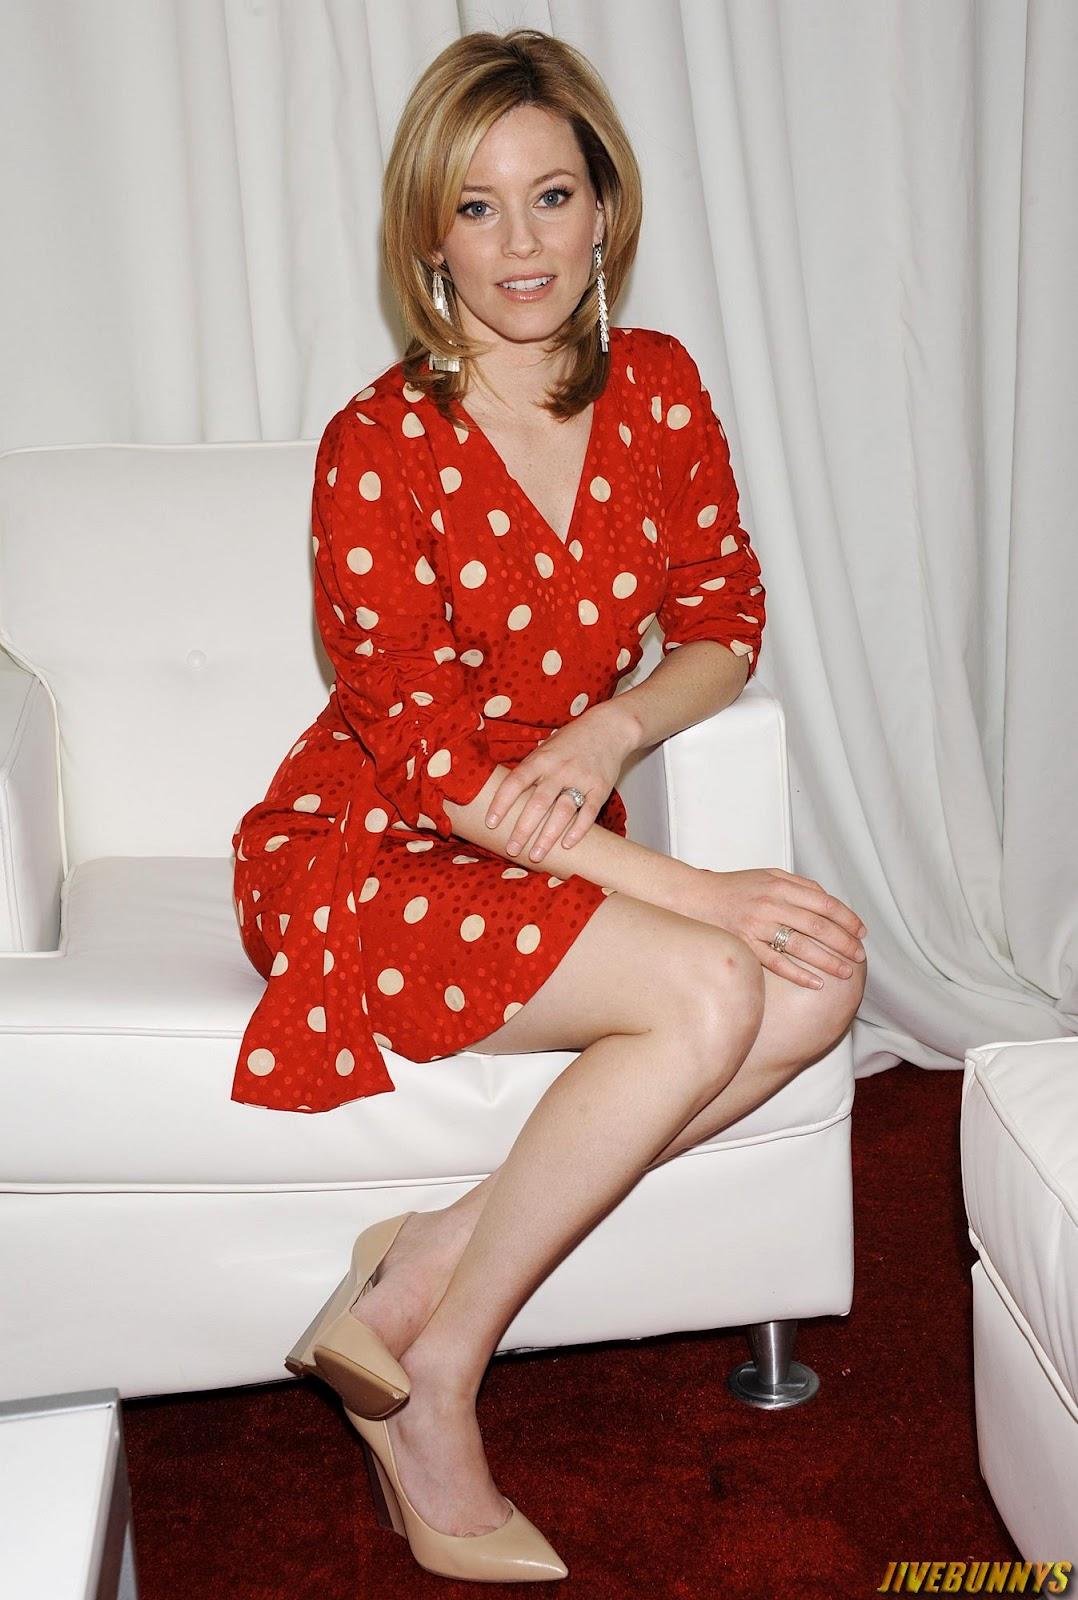 elizabeth-banks-in-stockings-foot-fetish-fucking